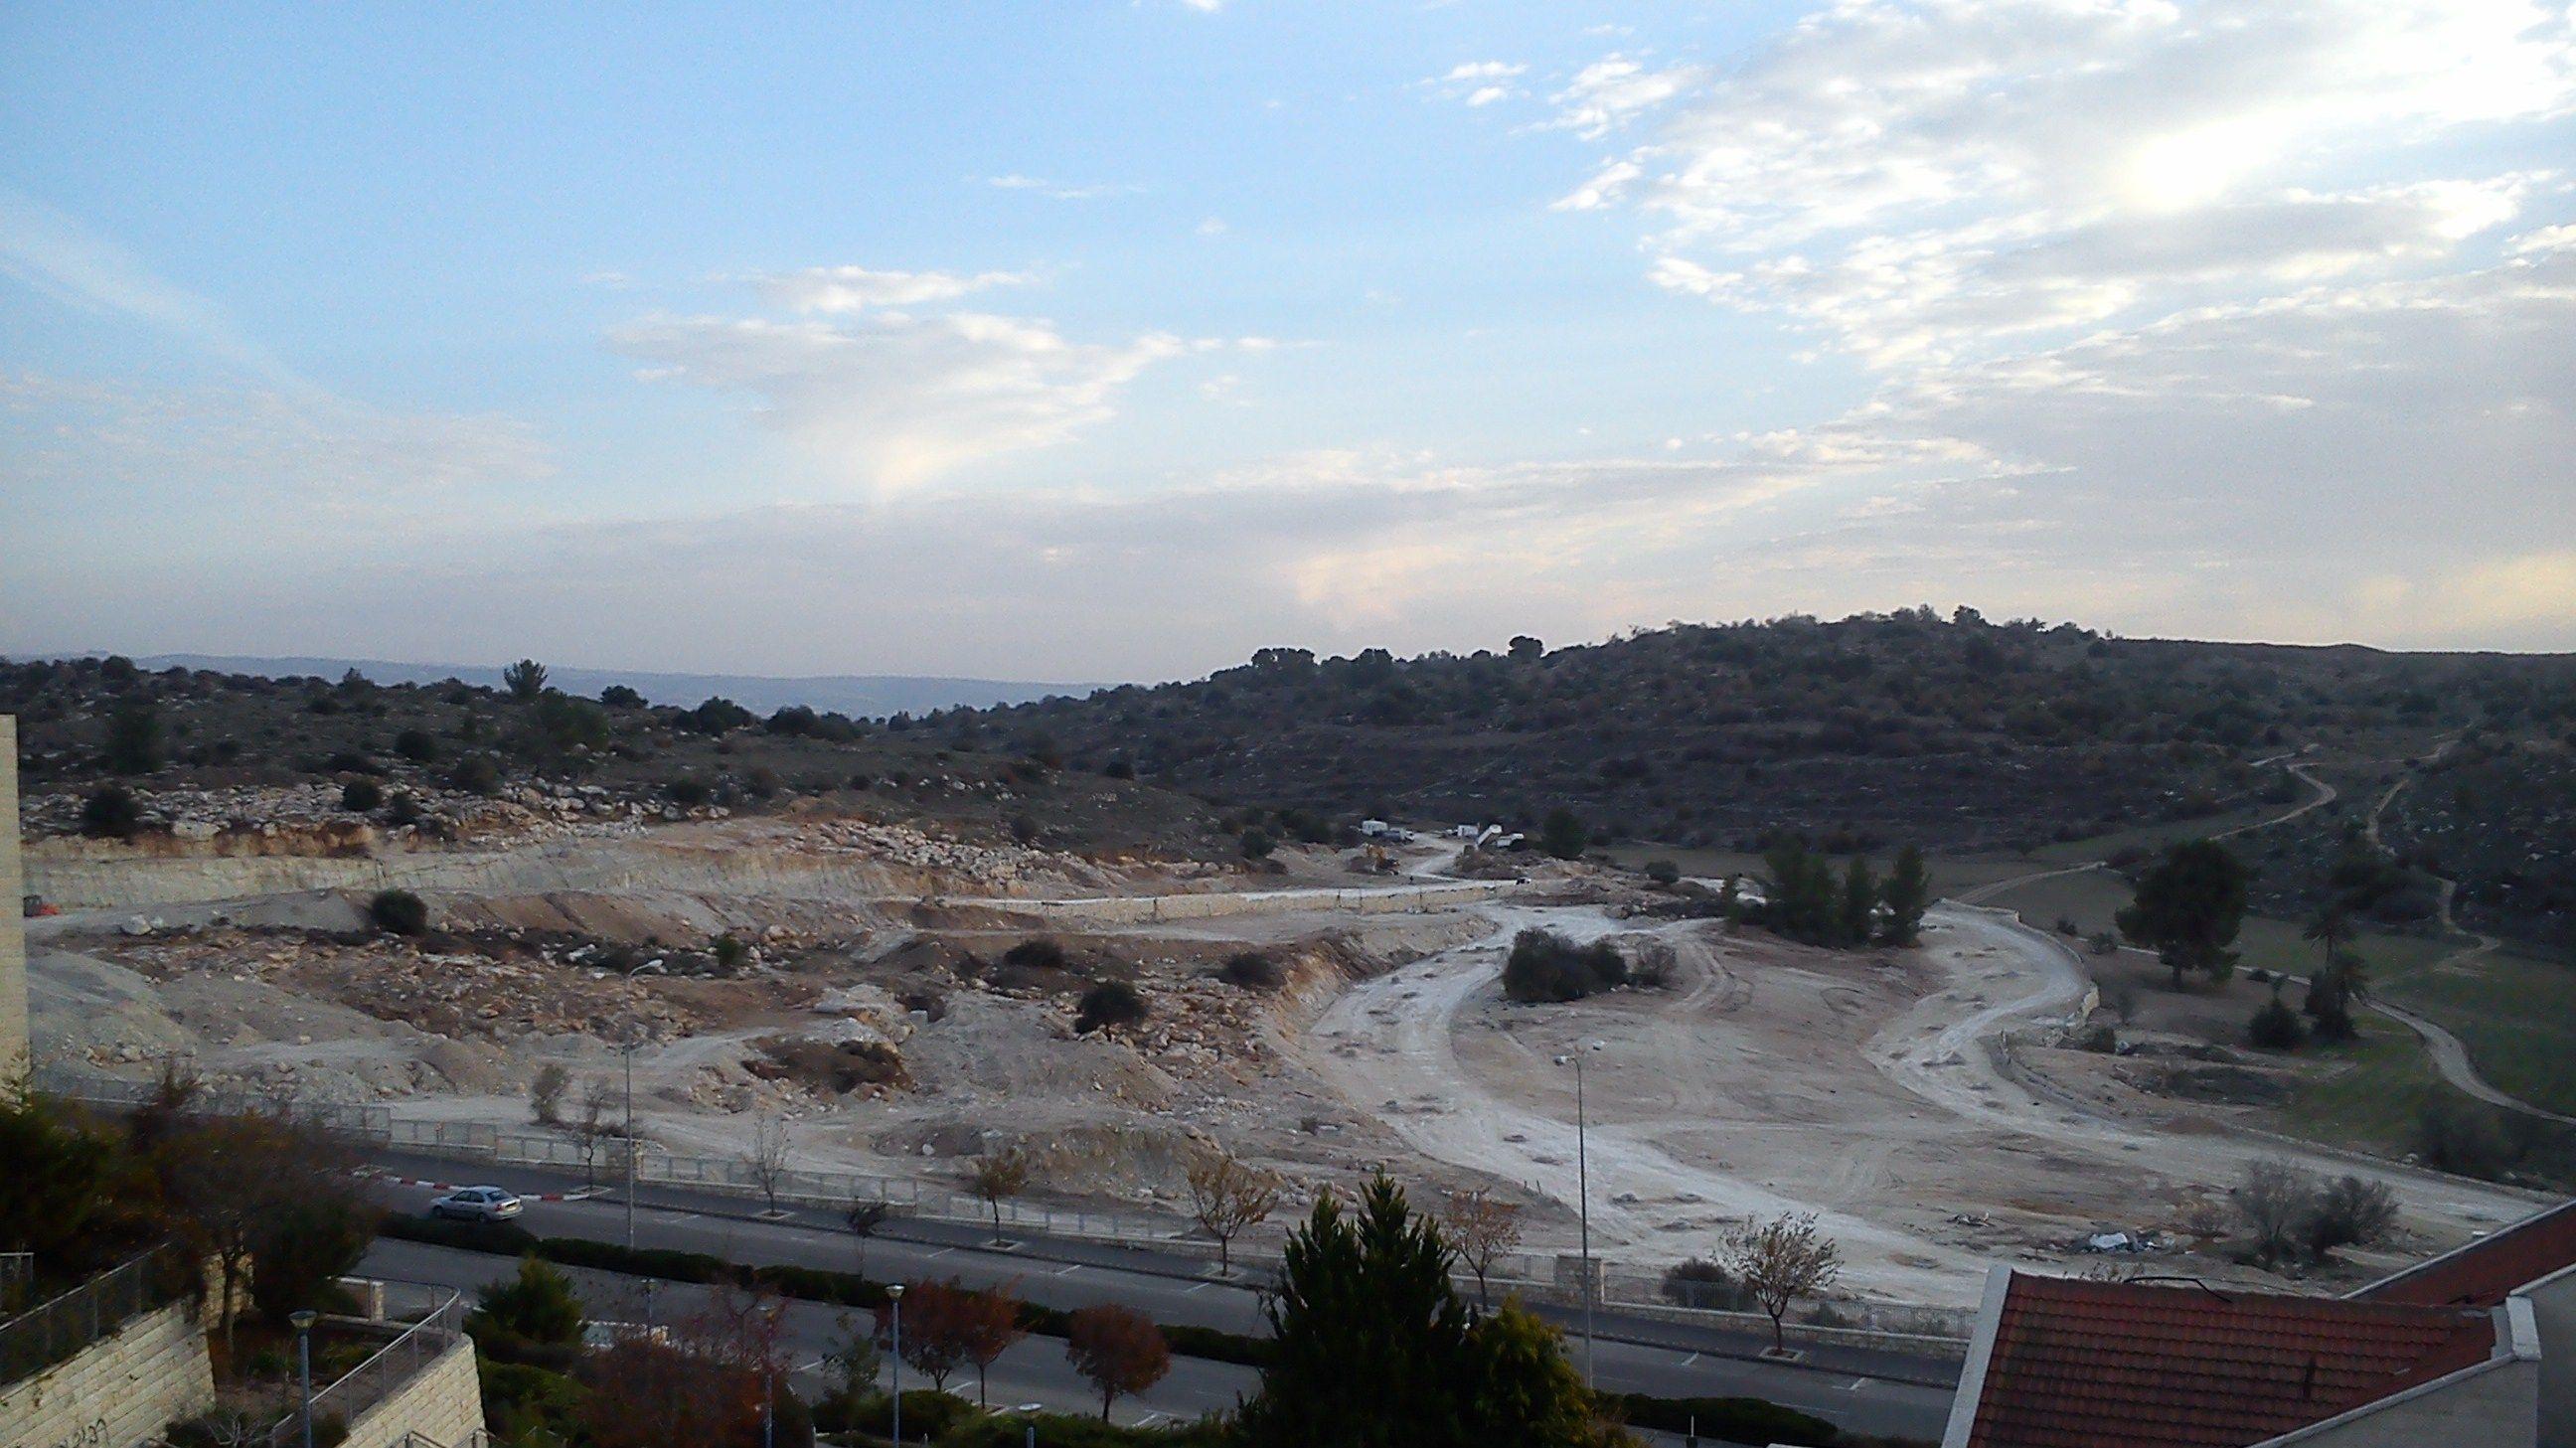 Beit Shemesh New Construction: New Town, Sun Valley, Construction Site